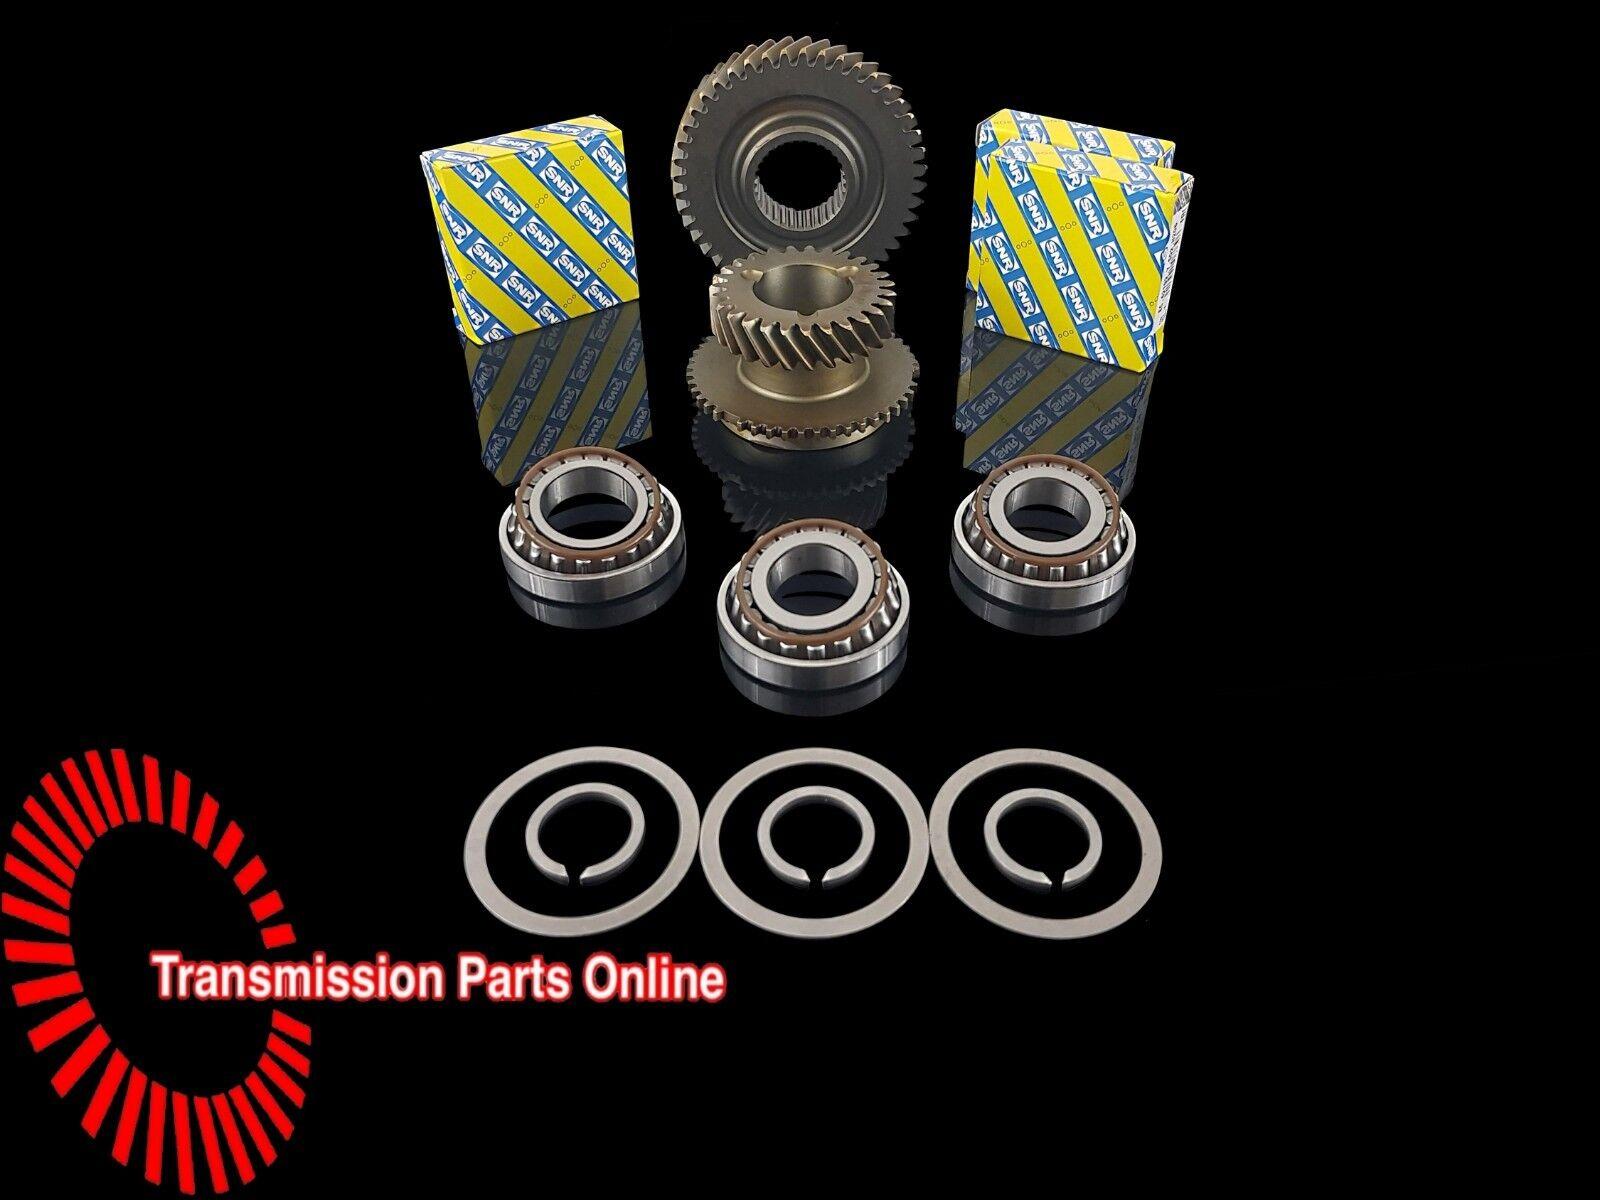 Fiat M20 /& M32 55mm Uprated SNR Top 3 Casing Bearings EC42192 /& EC42193